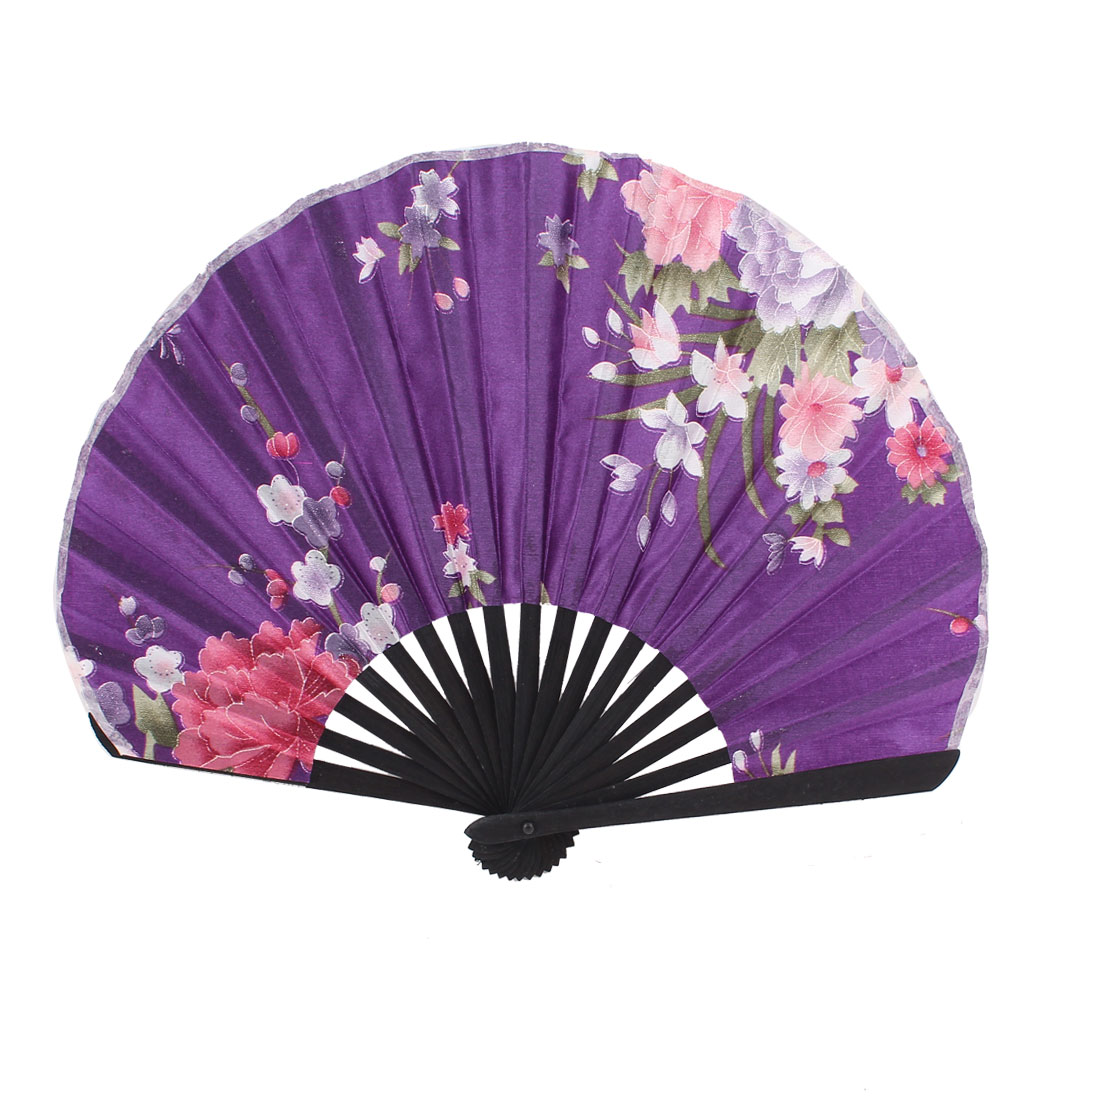 Bamboo Rim Oriental Chinese Style Dancing Decor Folded Hand Fan Purple